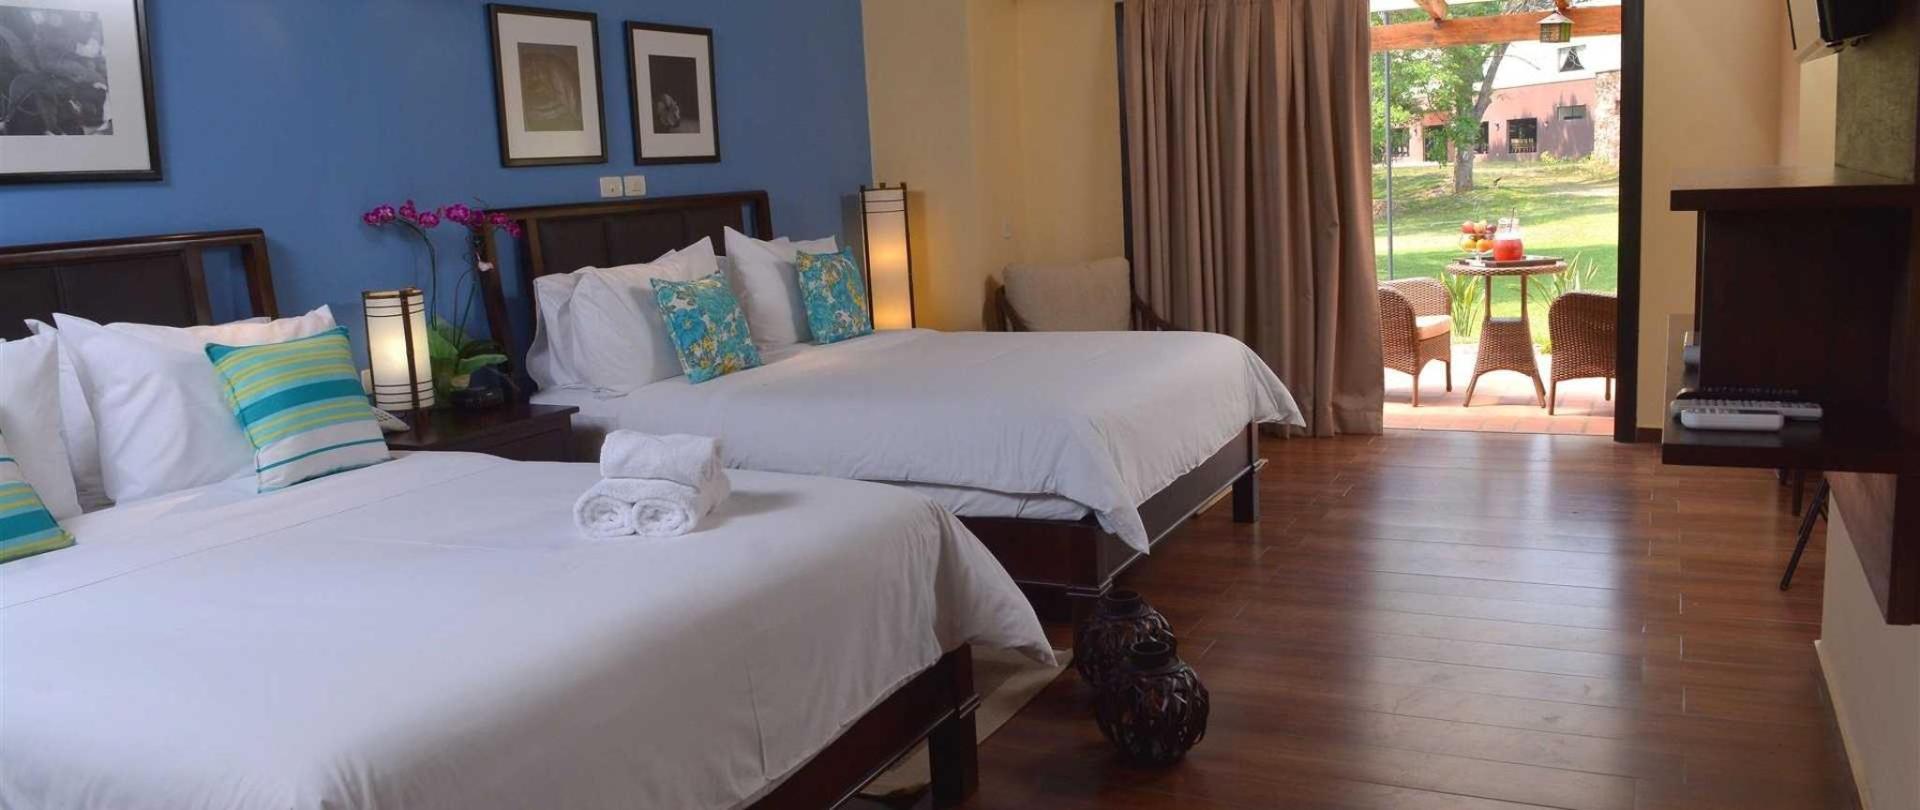 Hotel Alta Gracia Parque